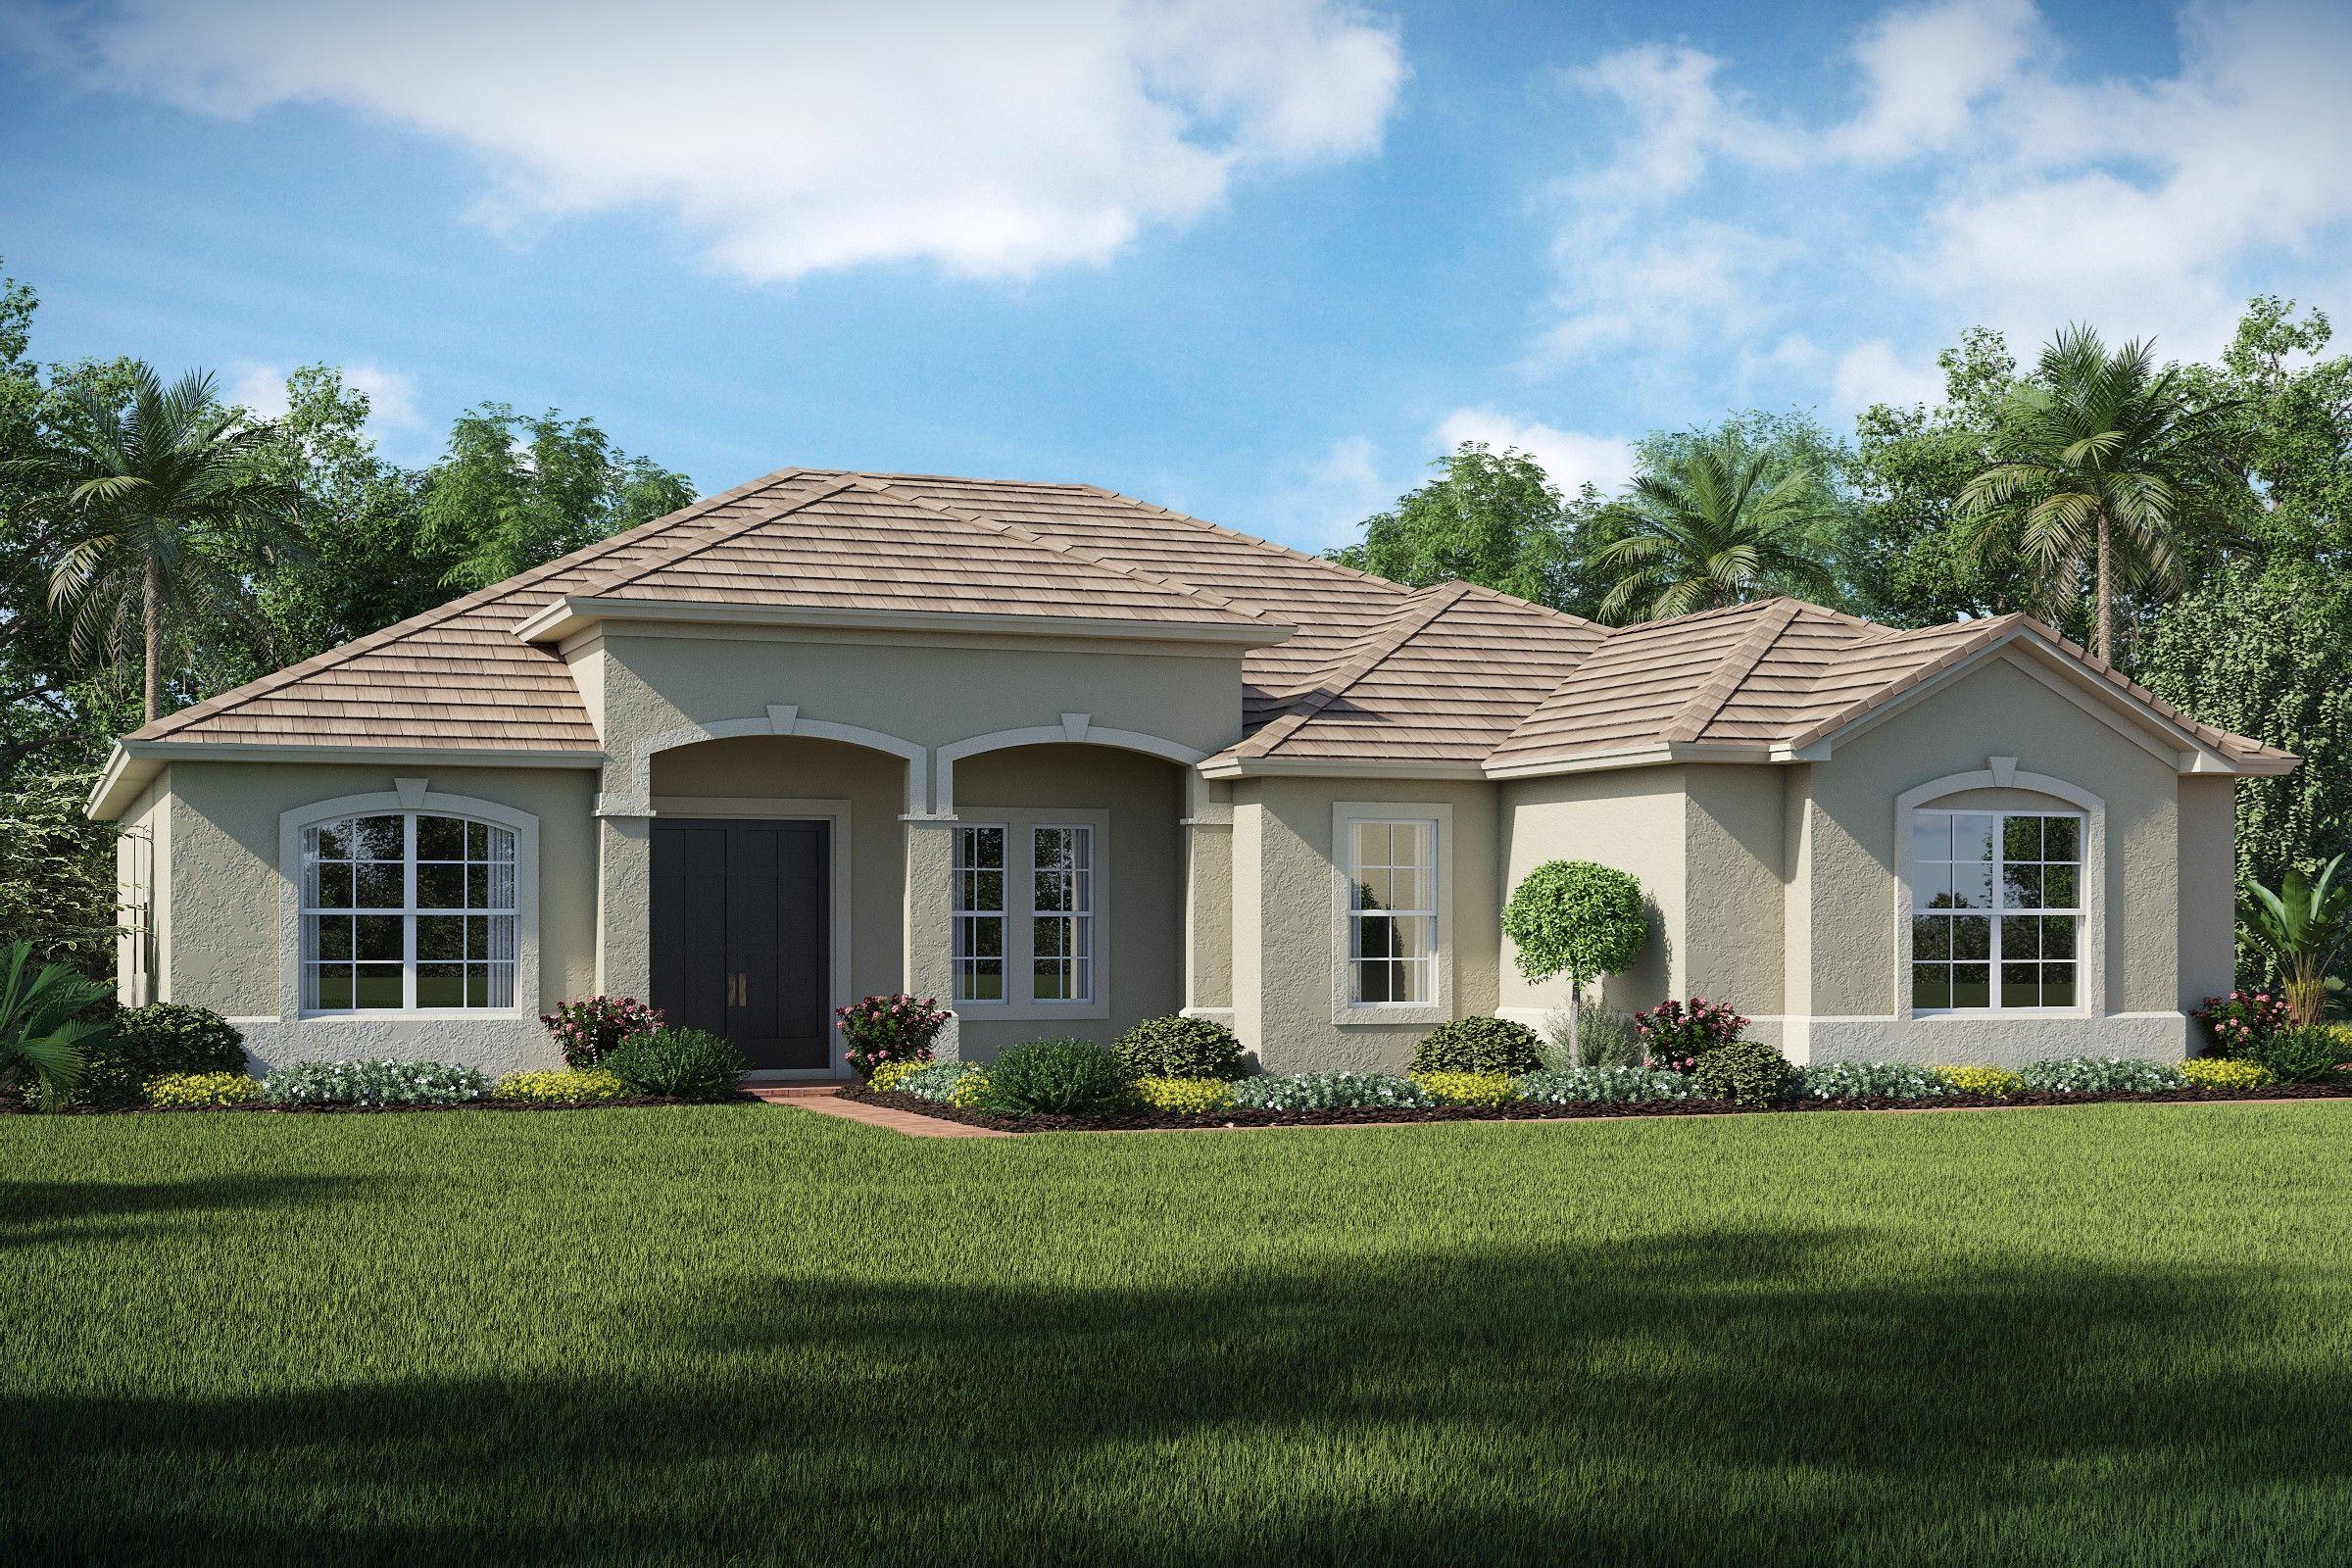 Single Family for Sale at Islamorada Ii 31754 Red Tail Boulevard, Homesite 239 Sorrento, Florida 32776 United States